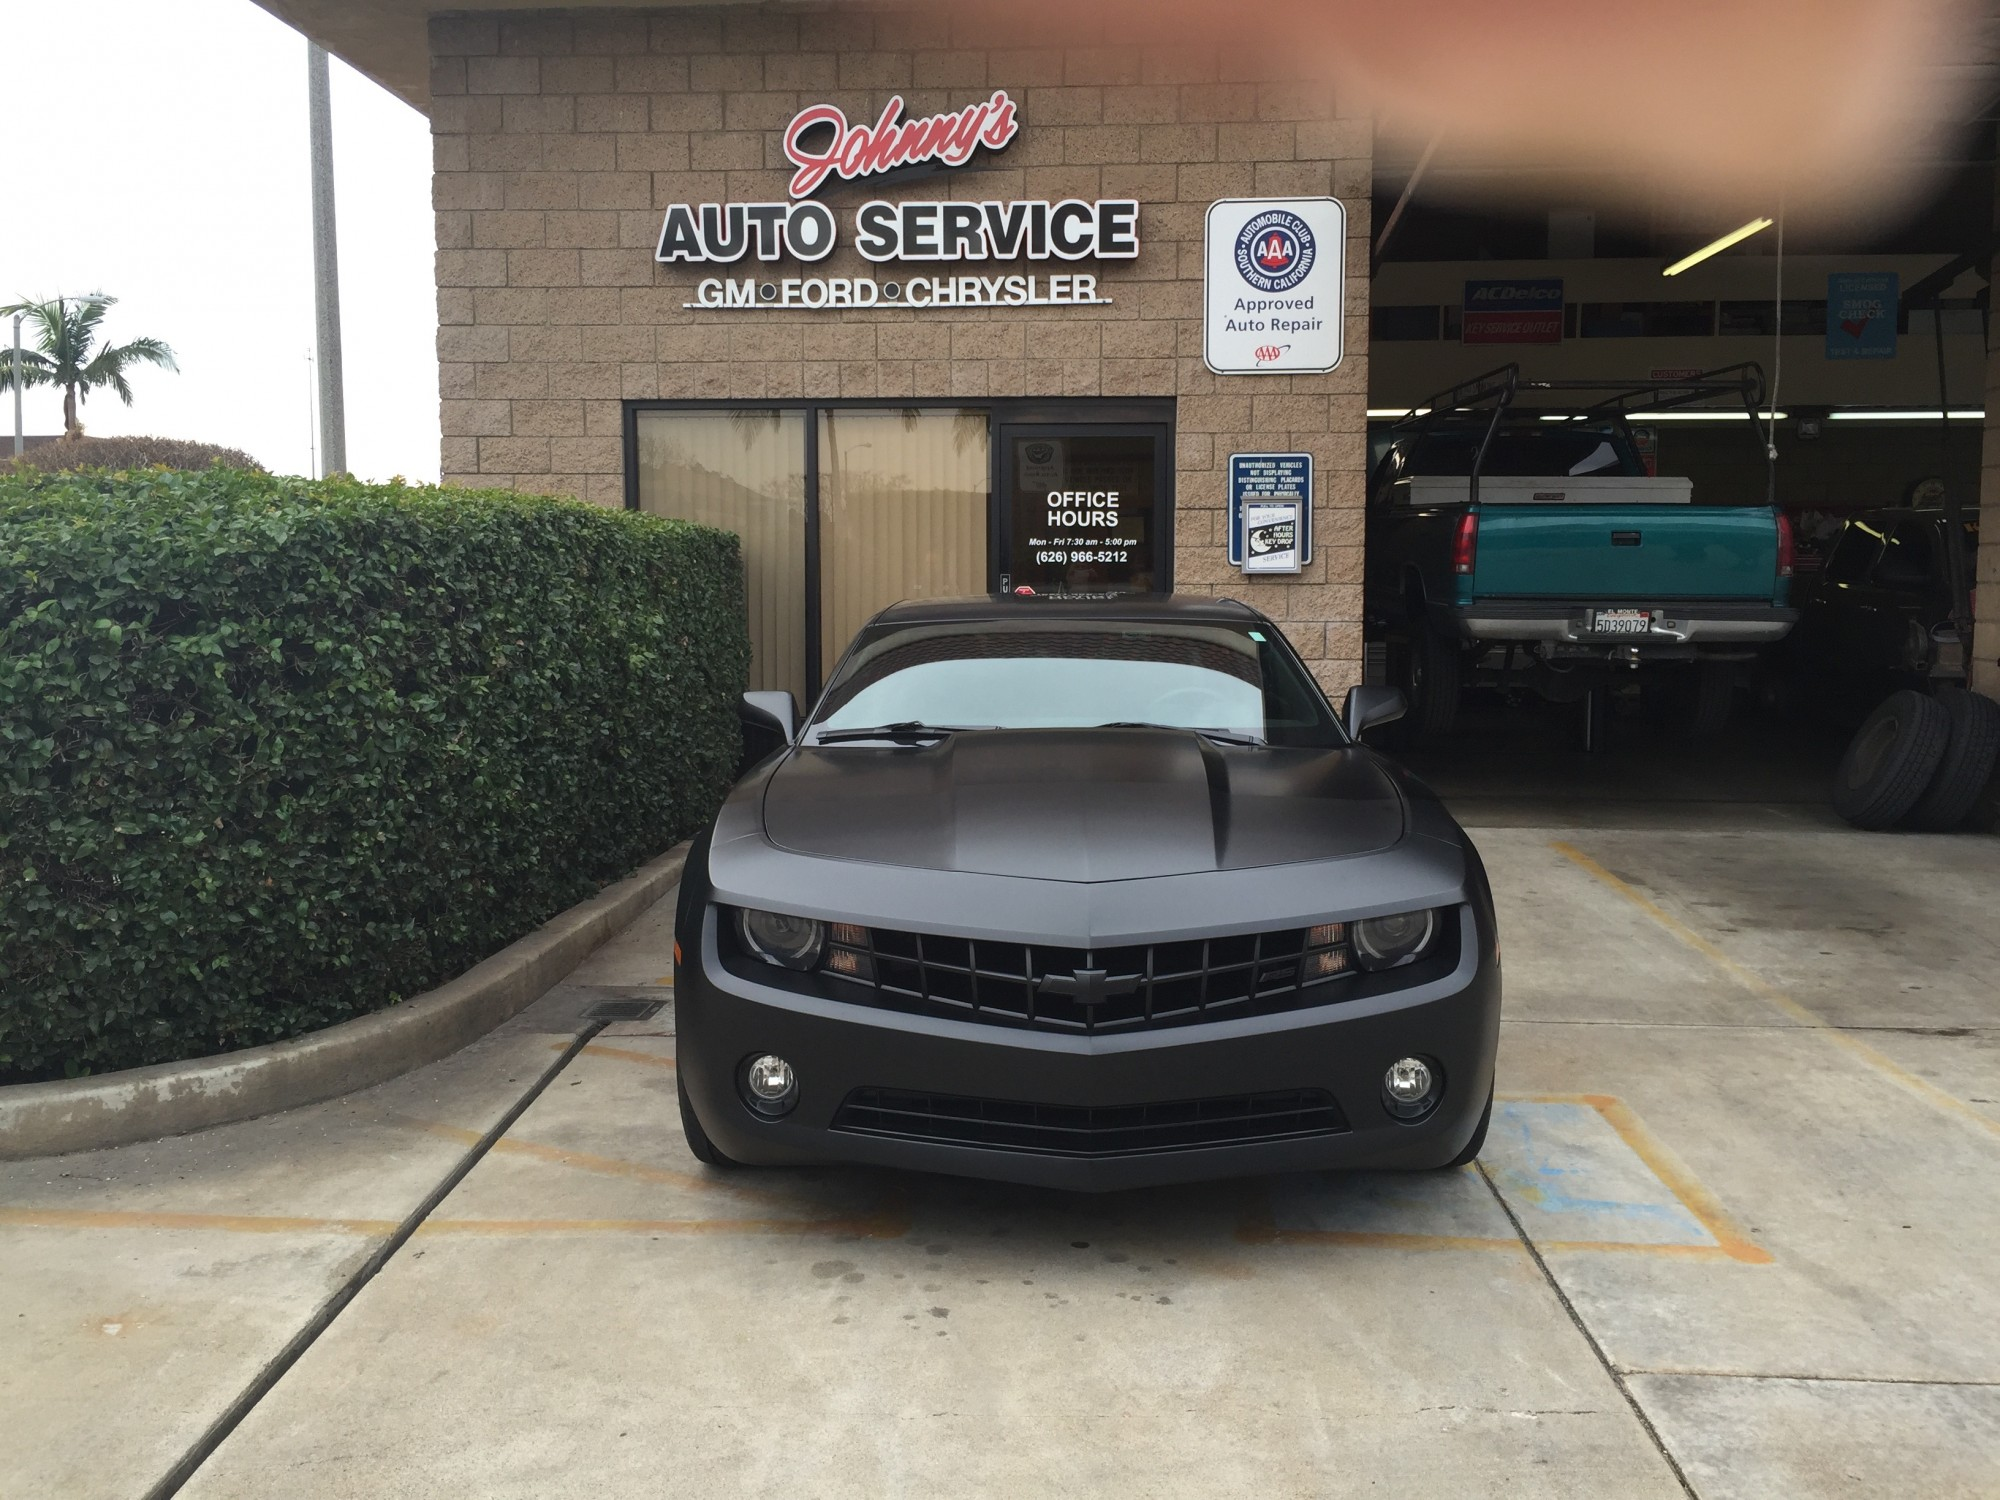 Black Camaro in front of shop